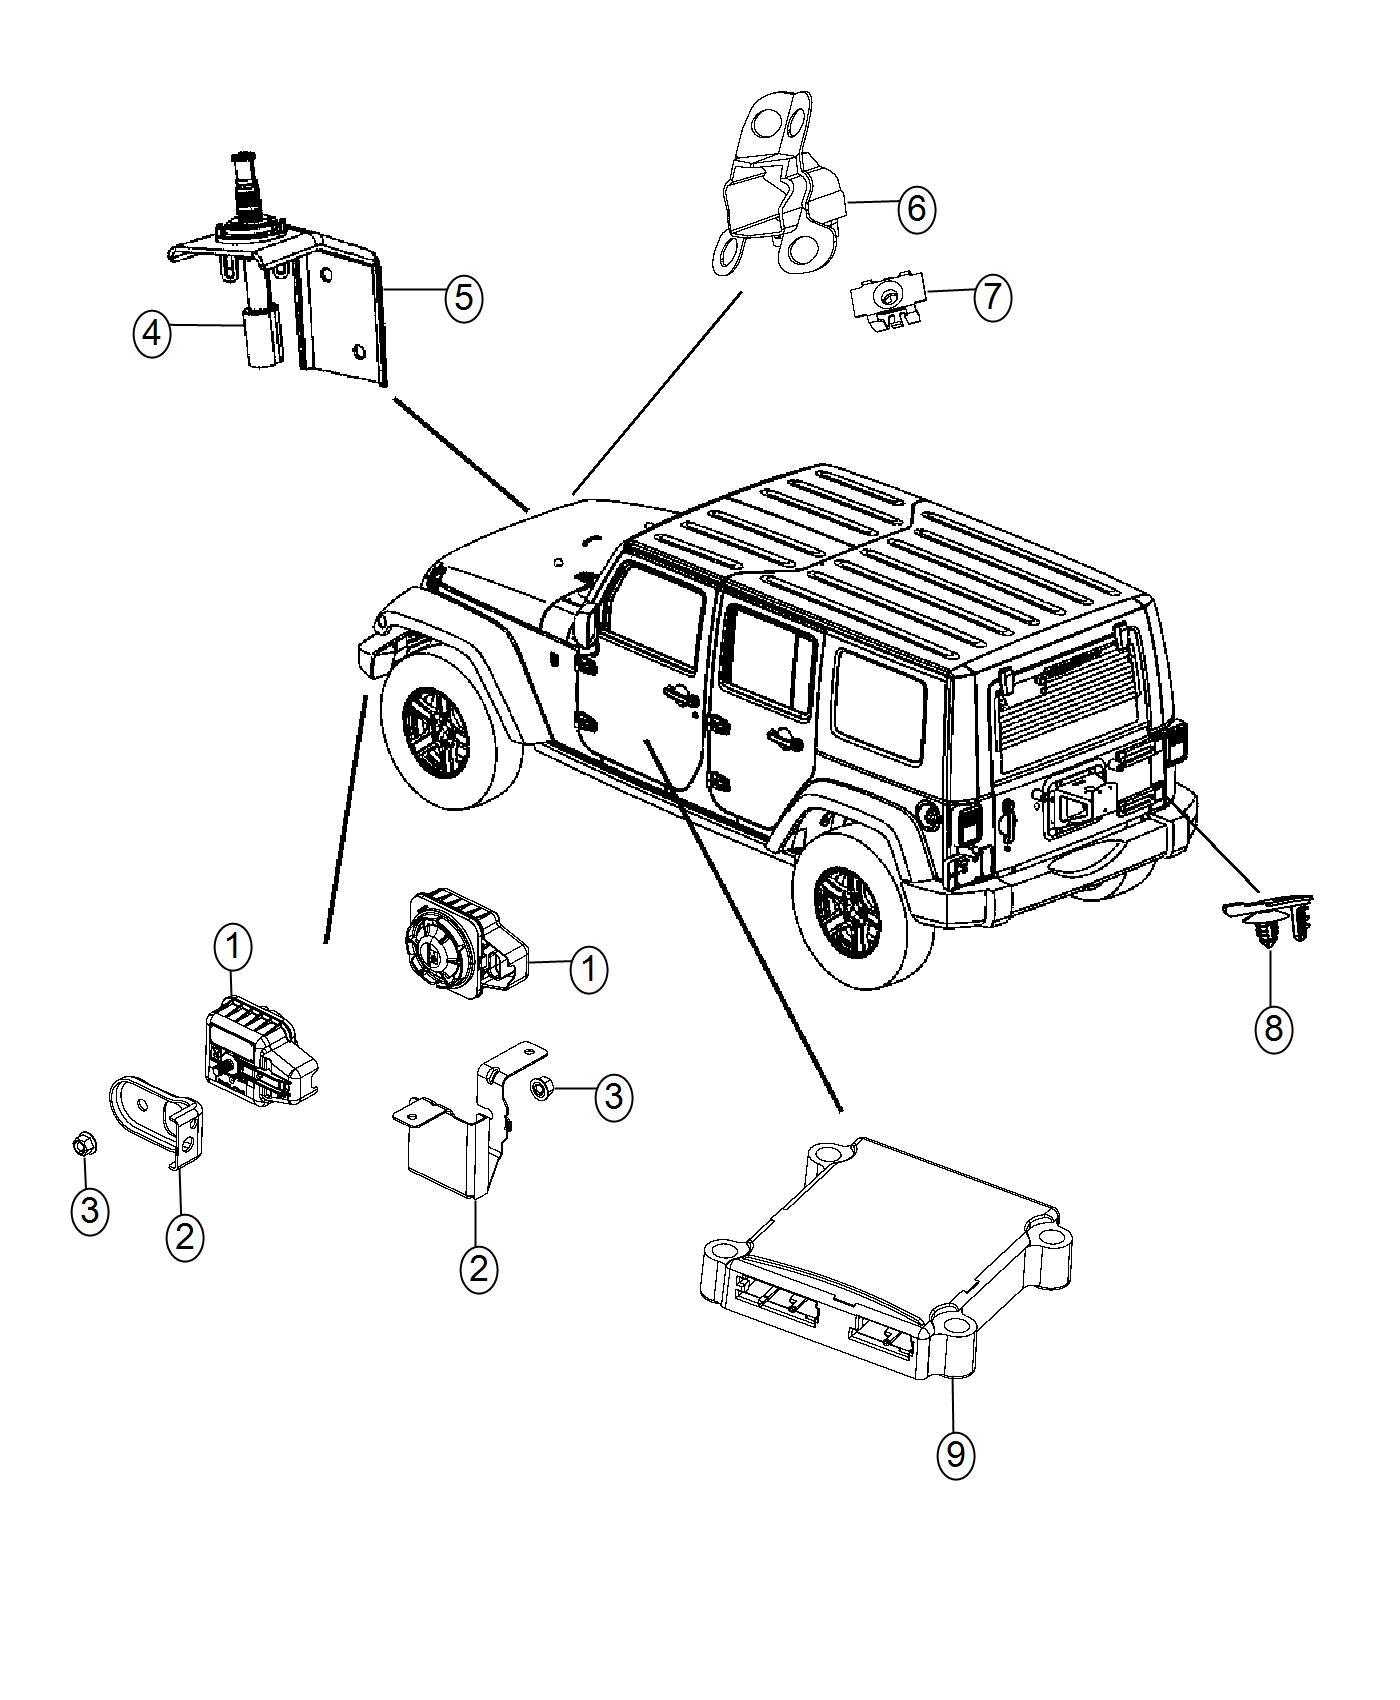 Jeep Wrangler Siren Alarm